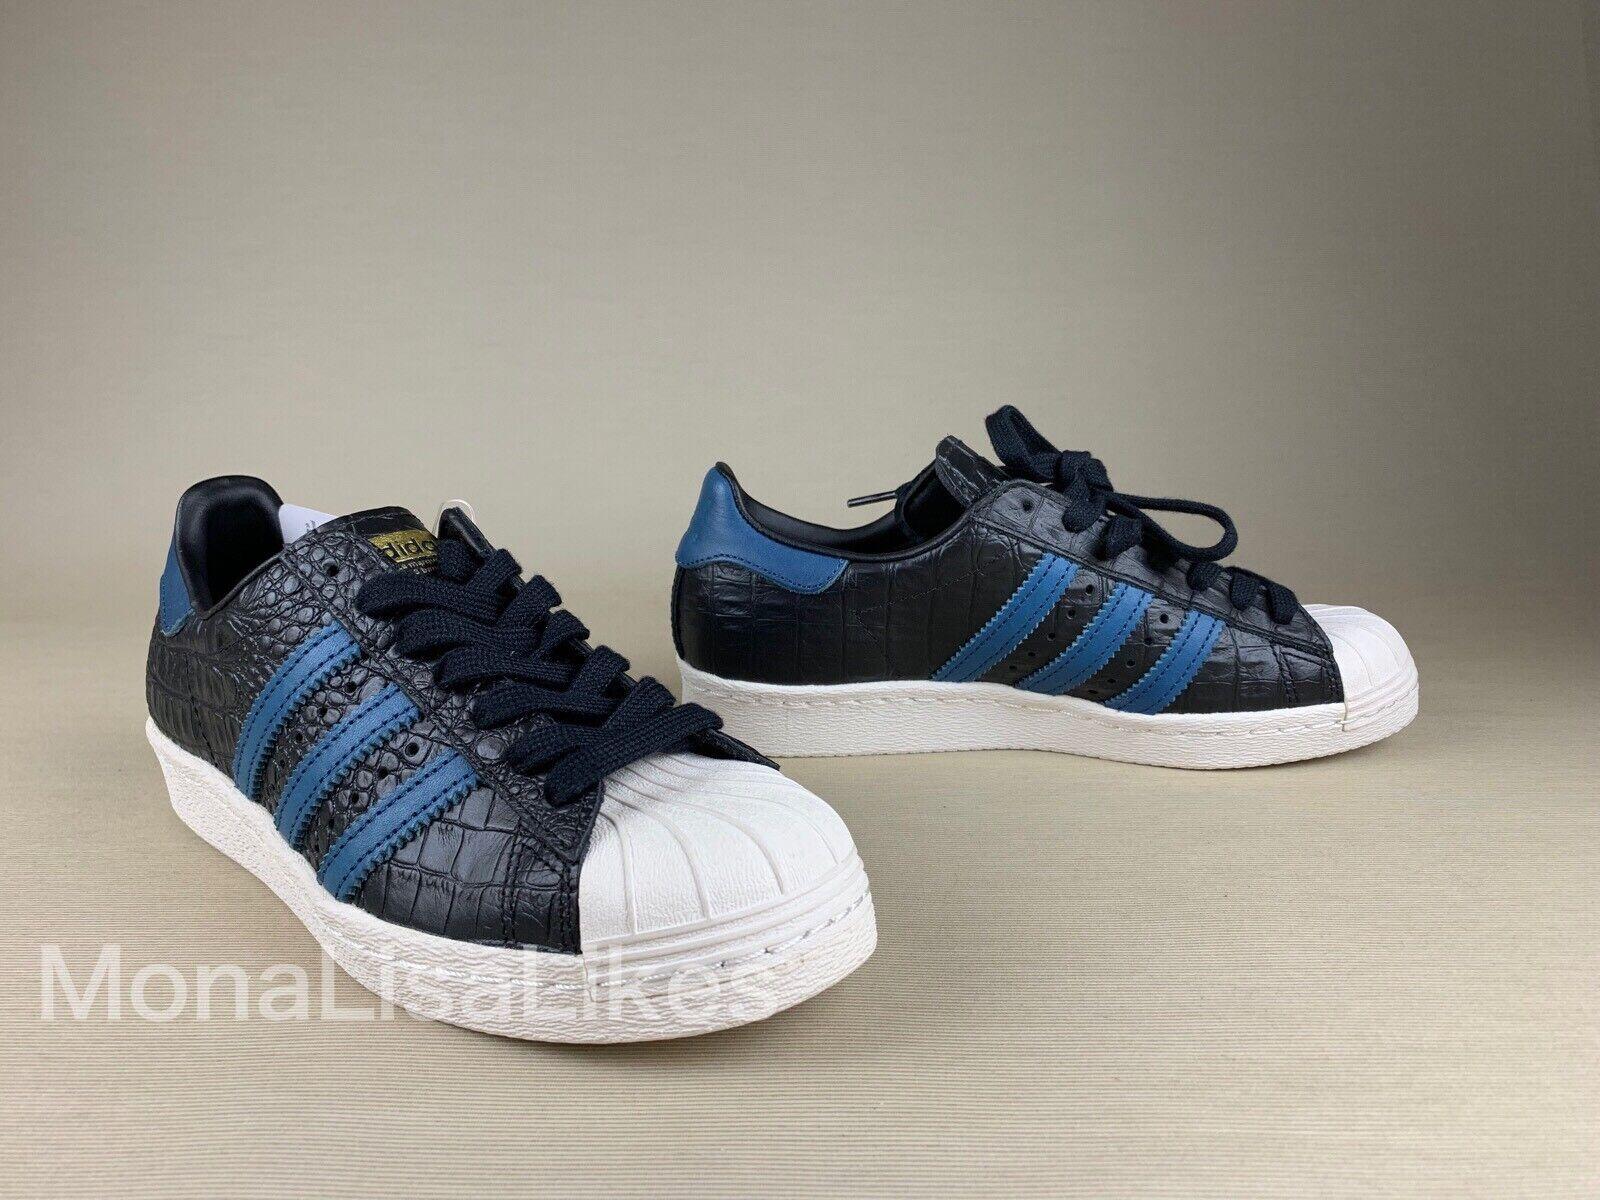 New ADIDAS Originals SUPERSTAR SUPERSTAR SUPERSTAR 80s Crocodile Embossed Black Sneakers shoes 37 59016b